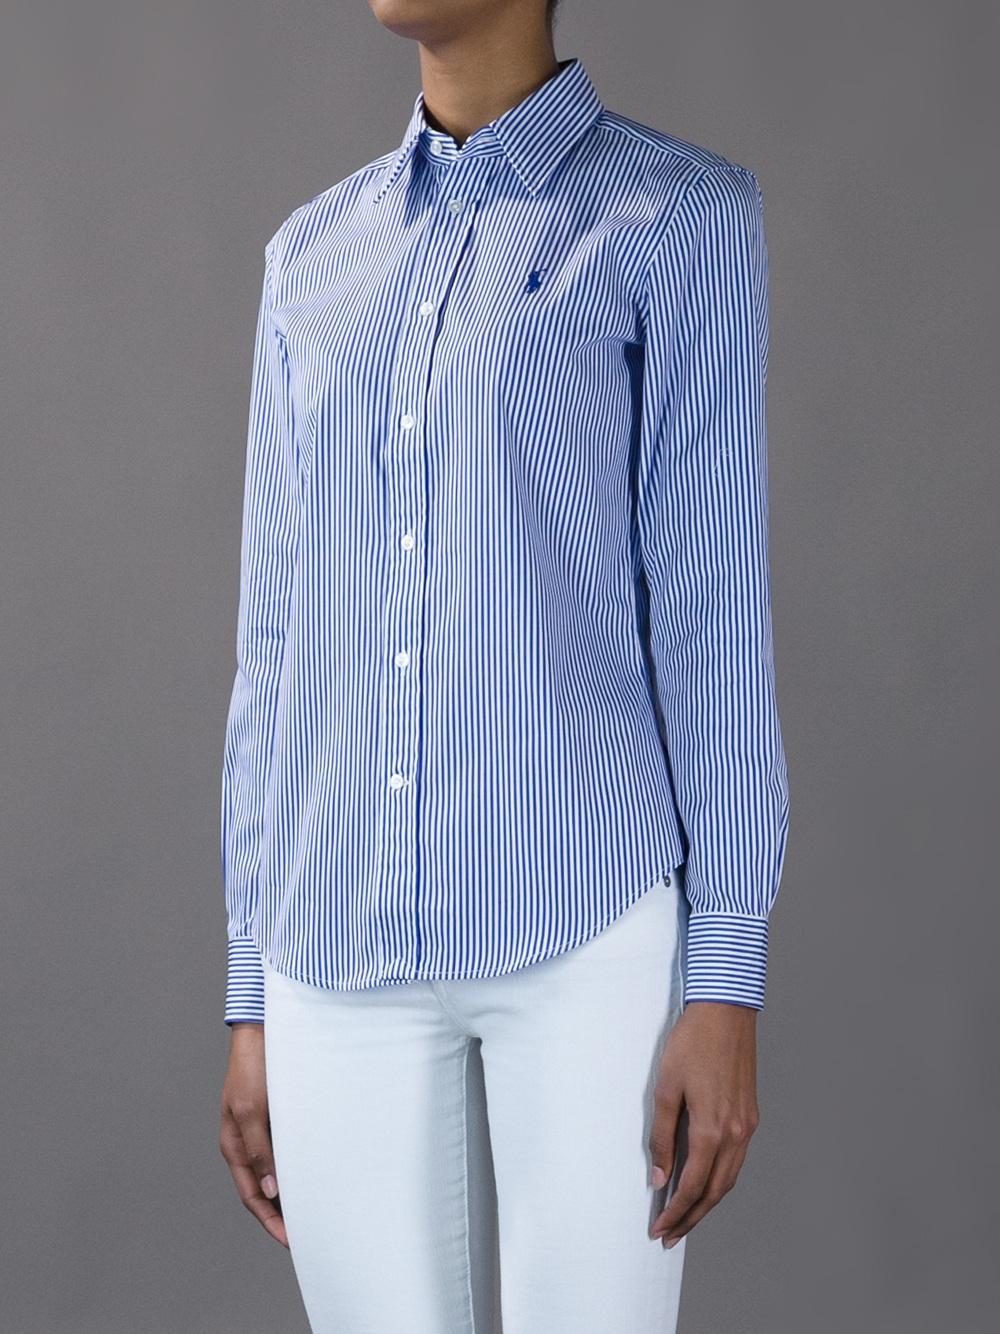 ralph lauren blue label striped button down shirt in blue. Black Bedroom Furniture Sets. Home Design Ideas